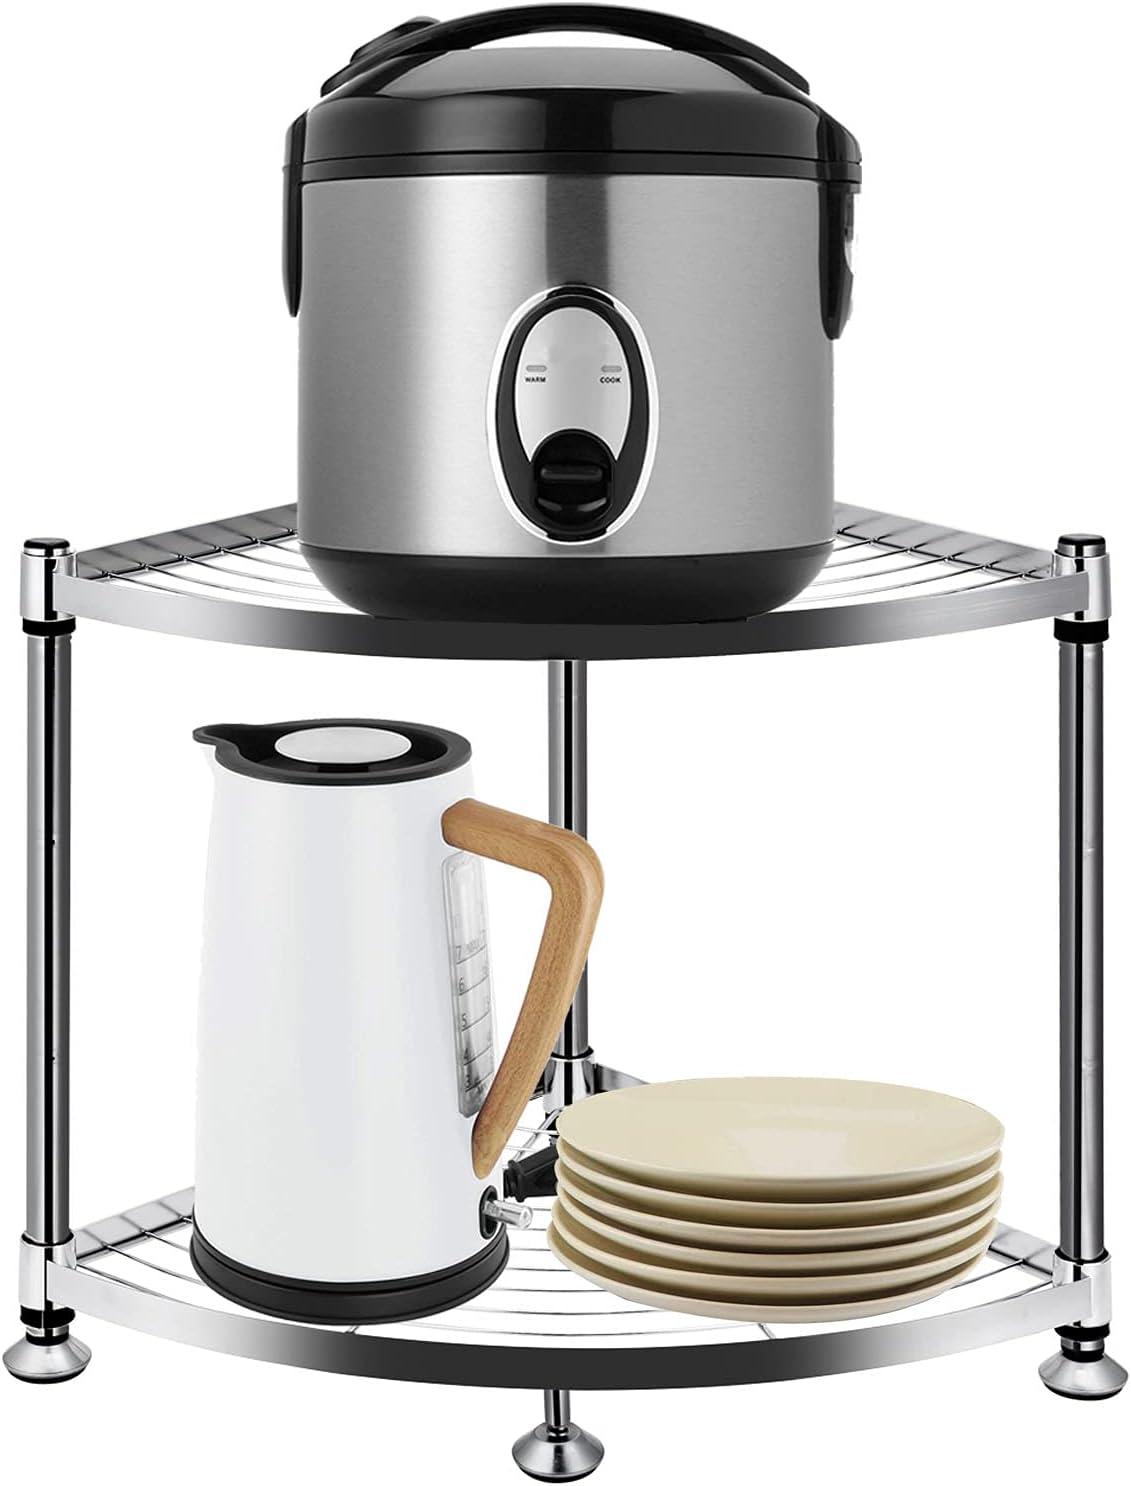 JXRCW Portland Mall 2-Tier Stainless Max 46% OFF Steel Kitchen Corner Holde Rack Shelf Pot